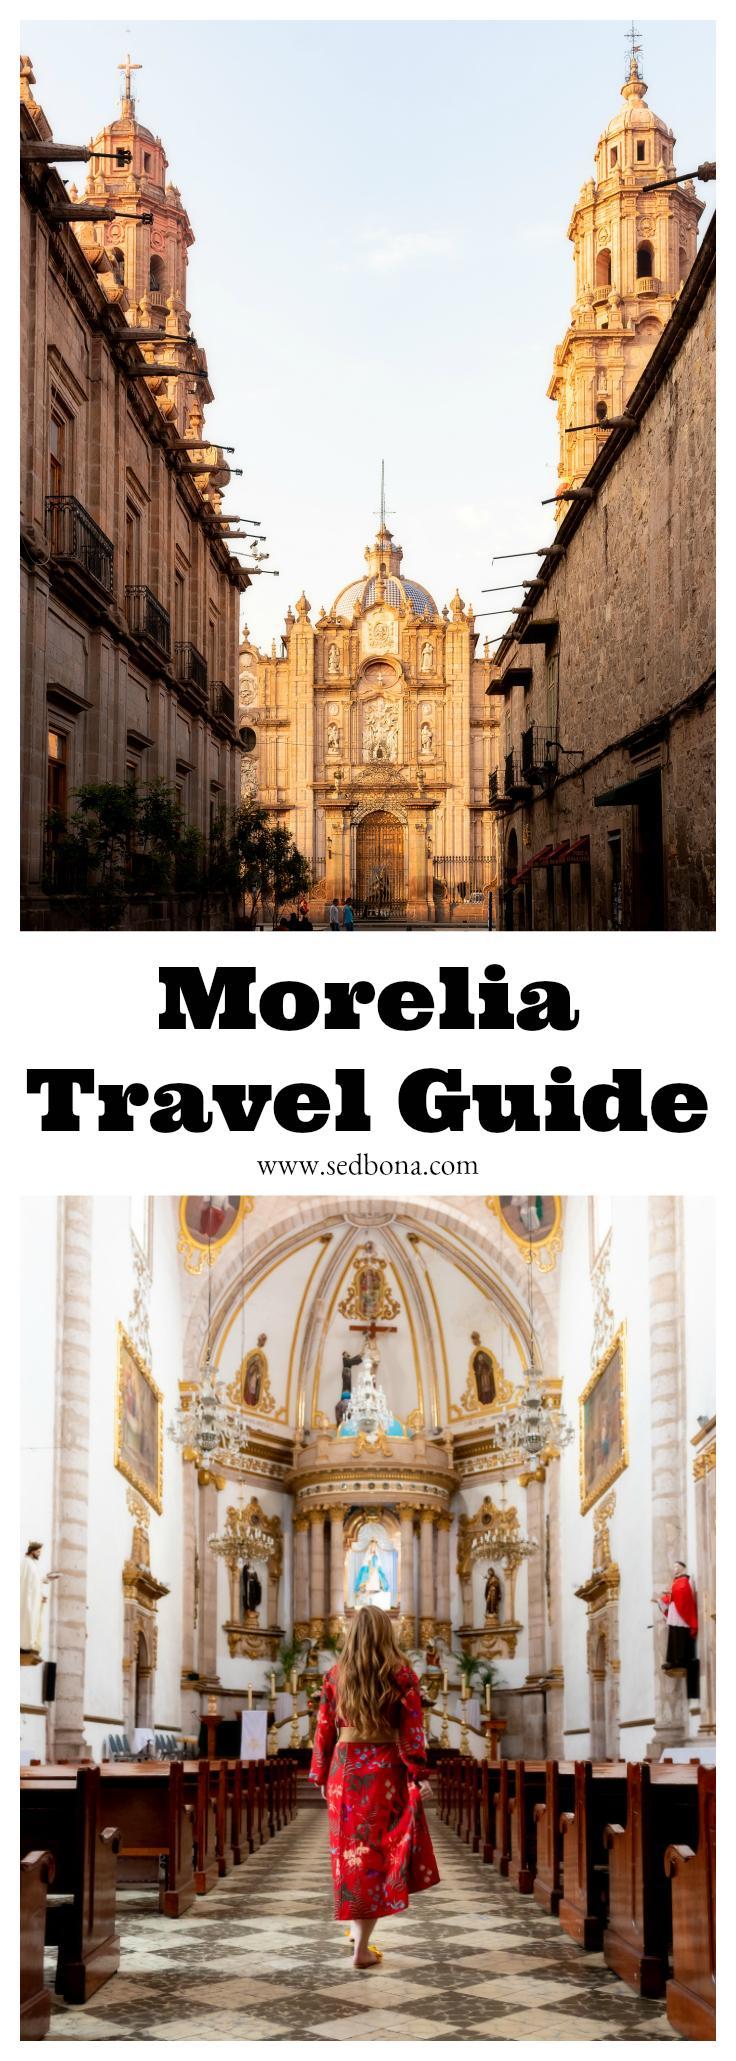 Morelia Travel Guide Sed Bona